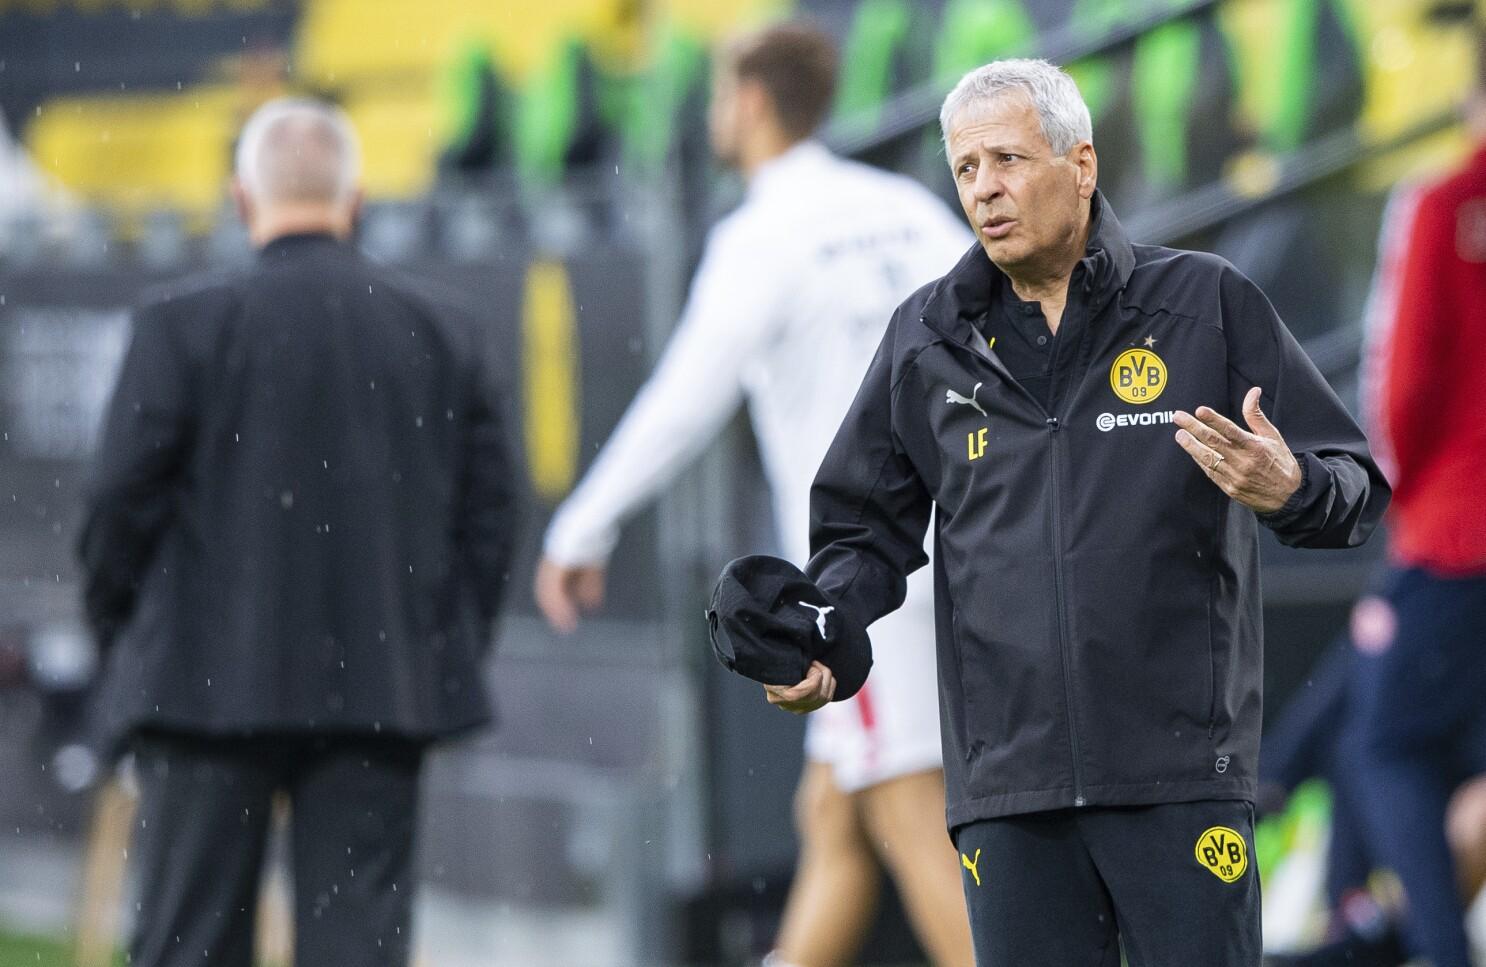 Dortmund Confirms Favre To Stay As Coach For Next Season The San Diego Union Tribune